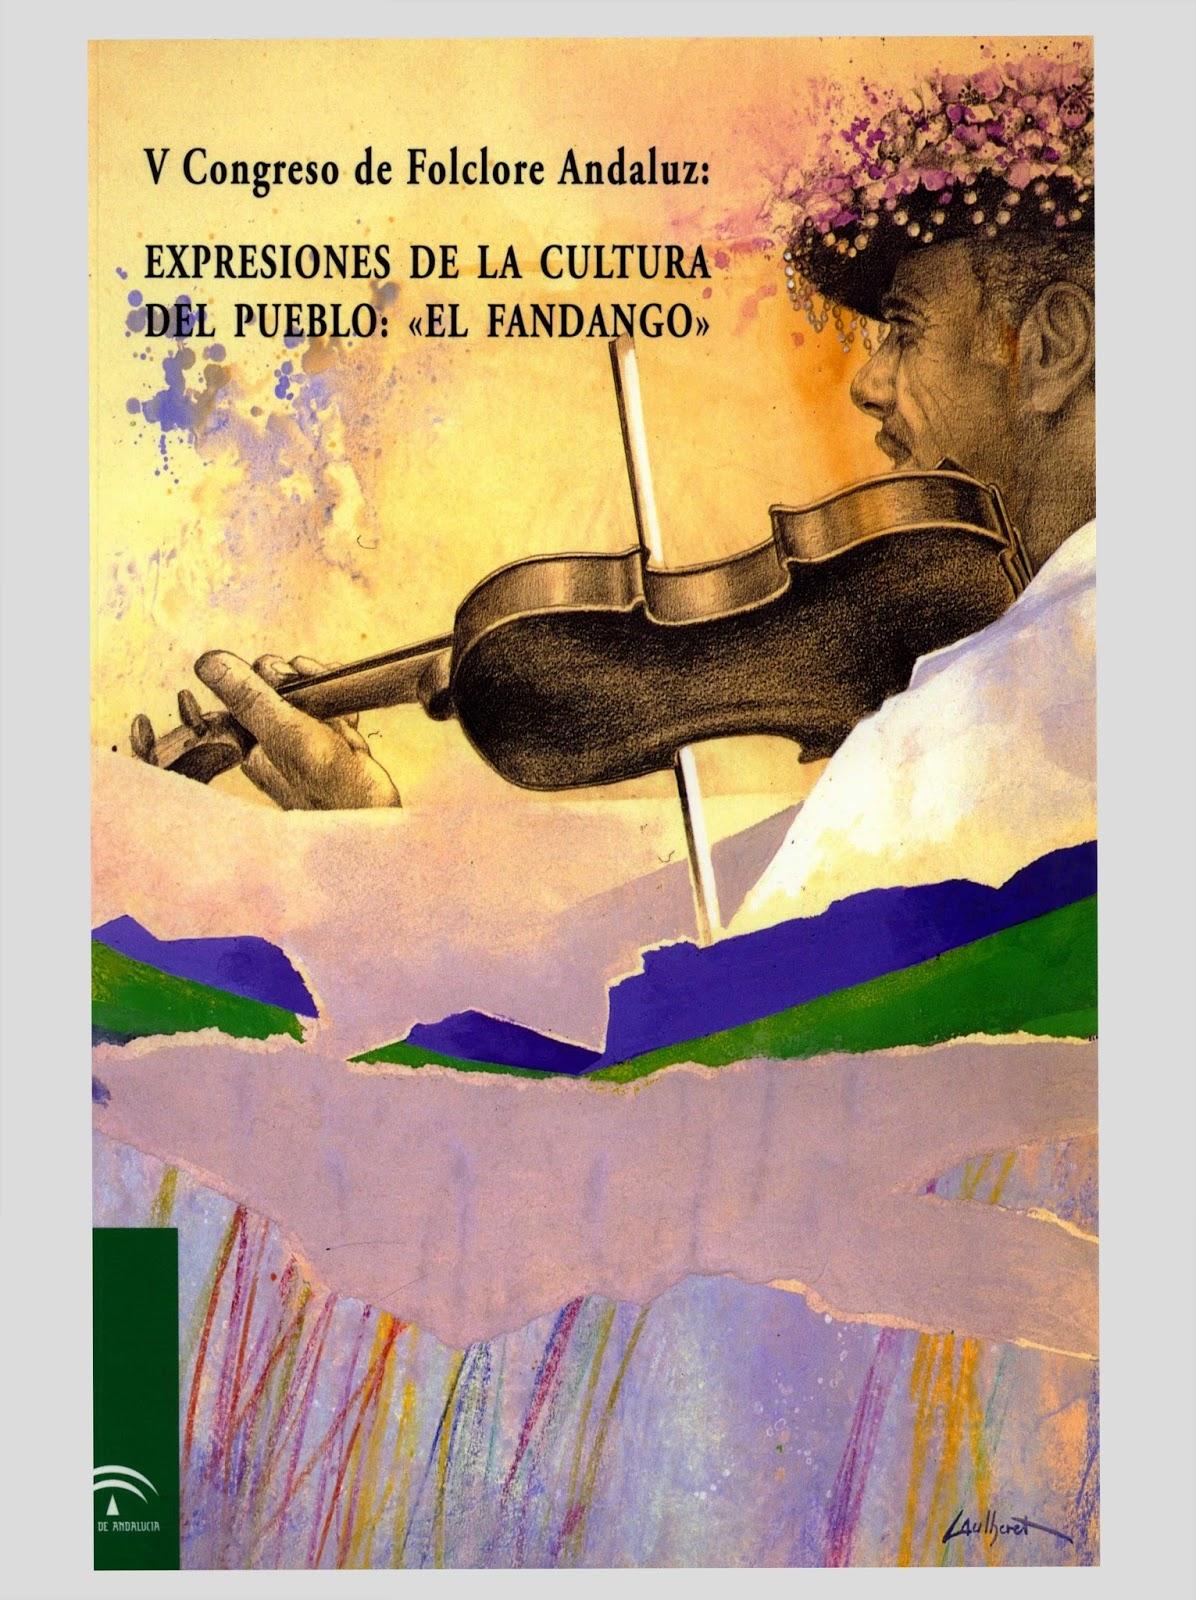 http://www.bibliotecavirtualdeandalucia.es/catalogo/catalogo_imagenes/imagen.cmd?path=1010408&posicion=2